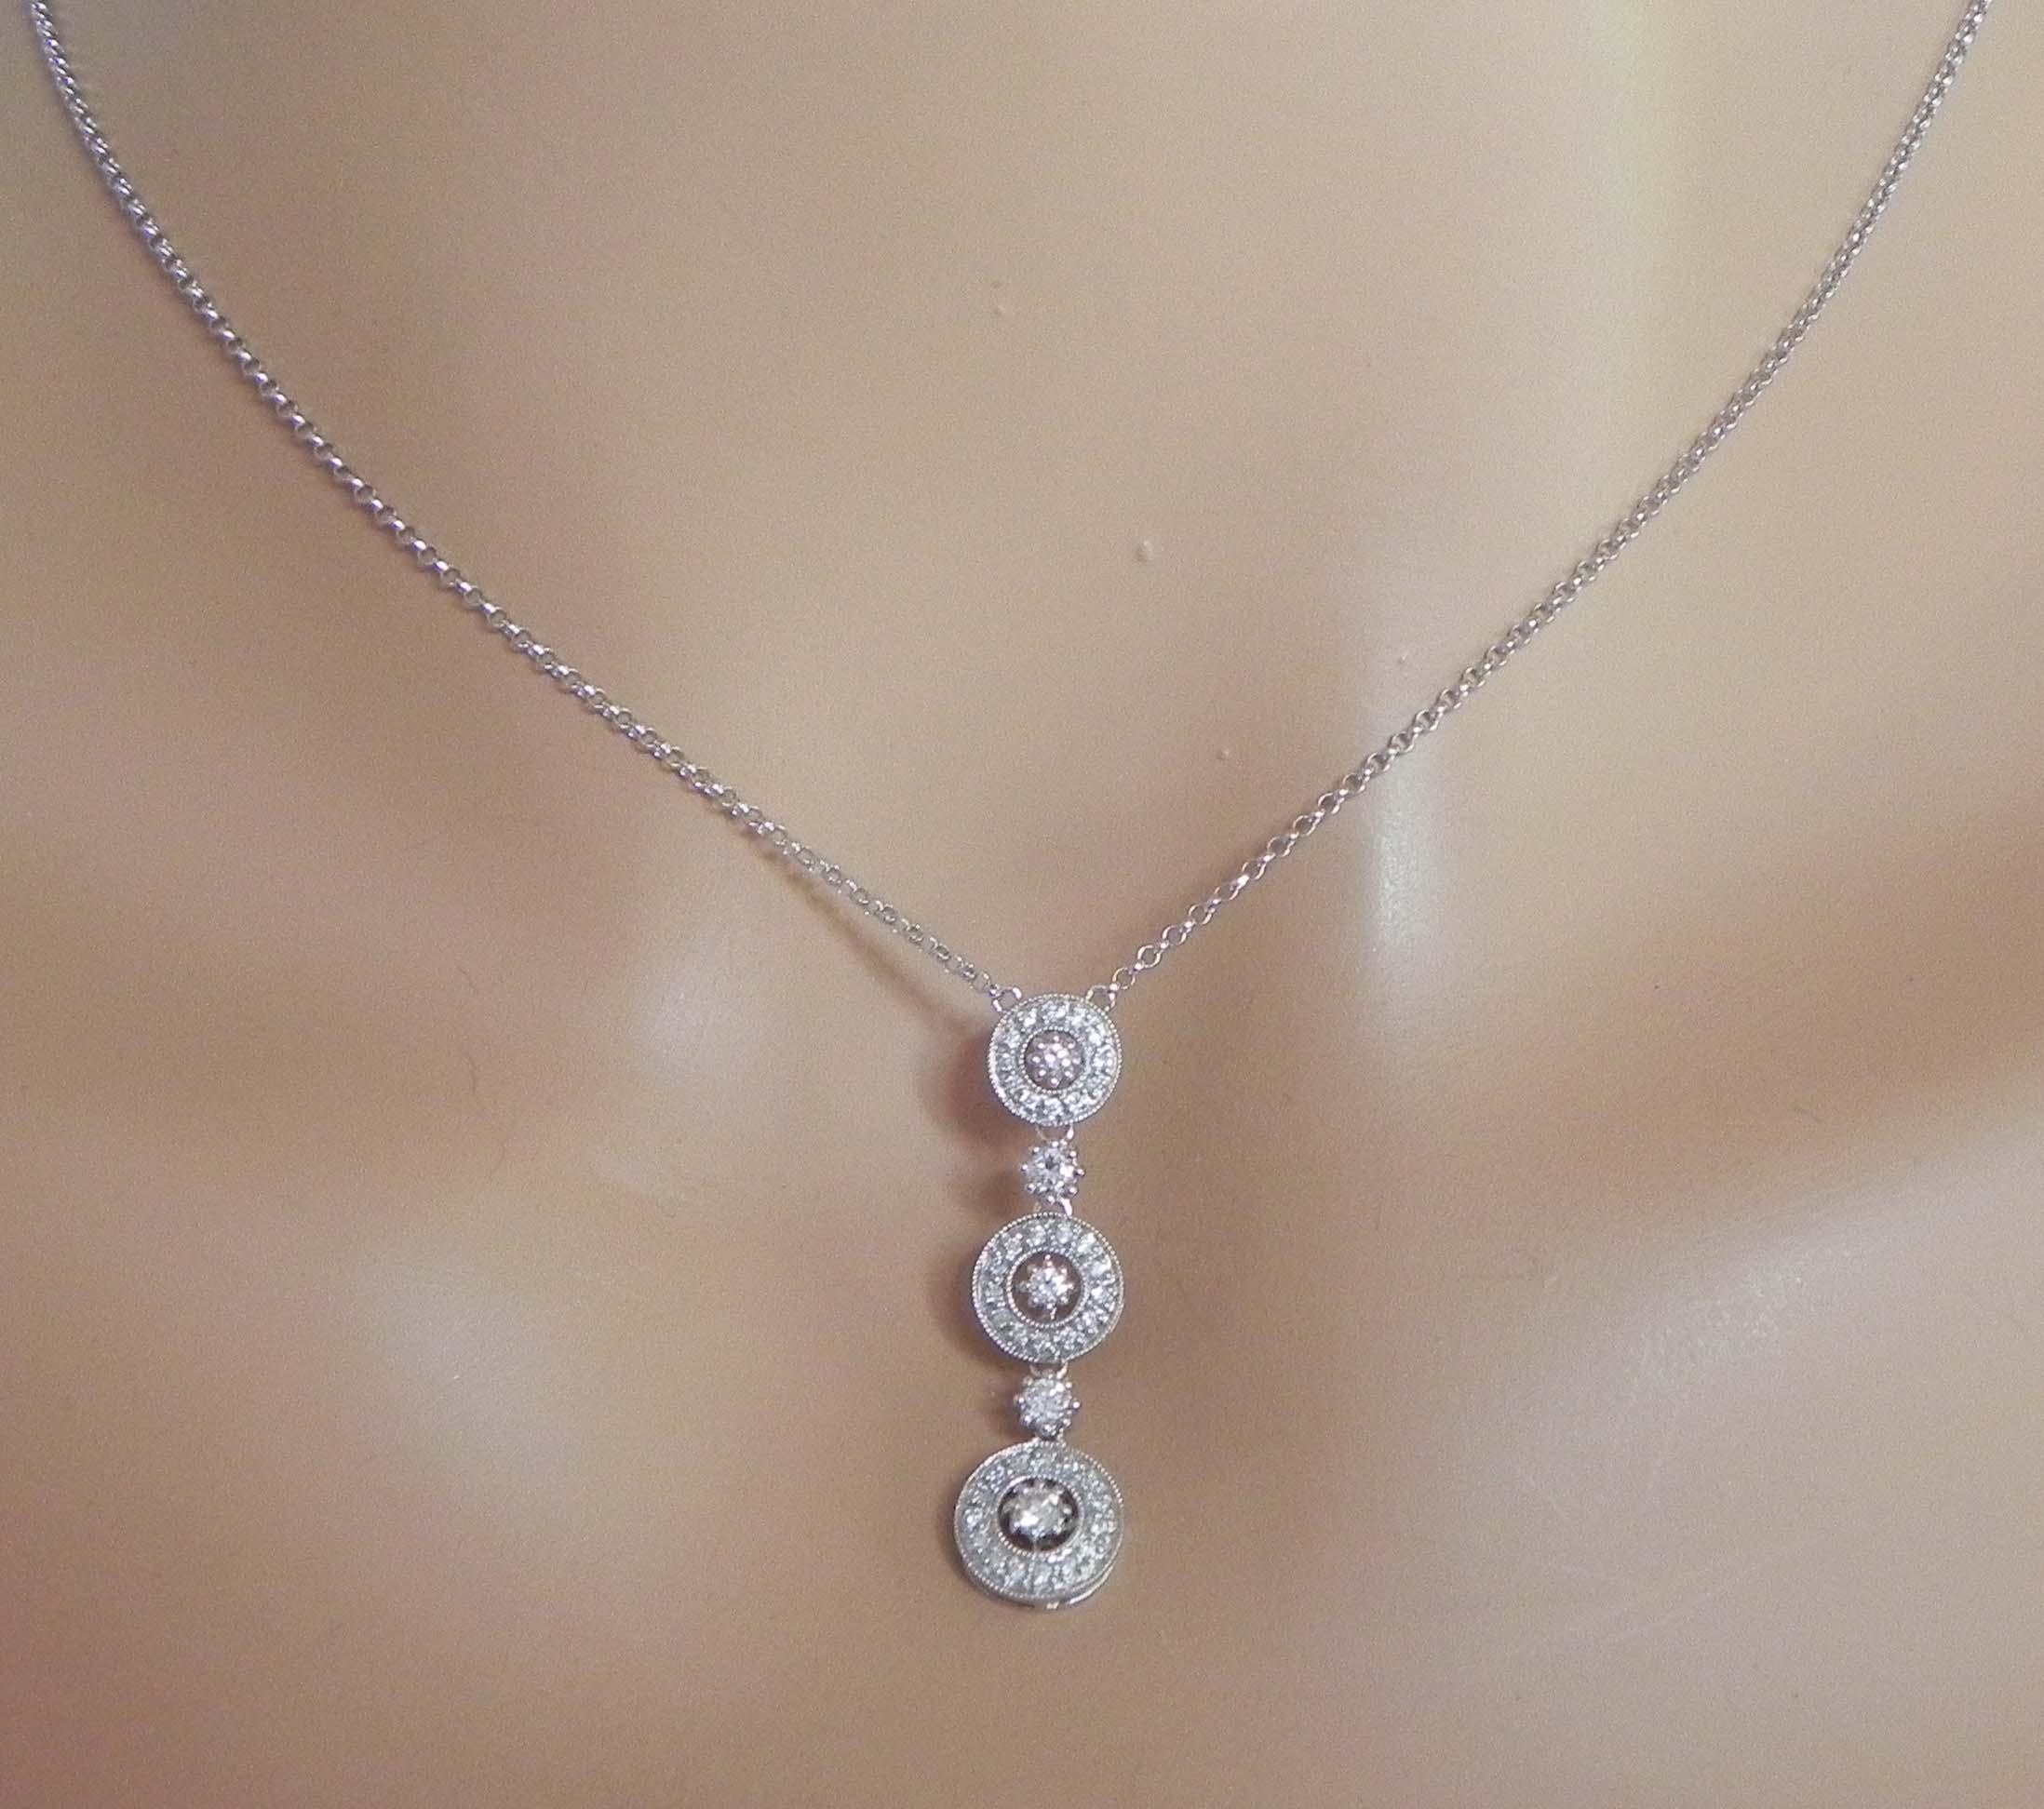 La s 14k White Gold Diamonds Triple Circle Pendant Necklace